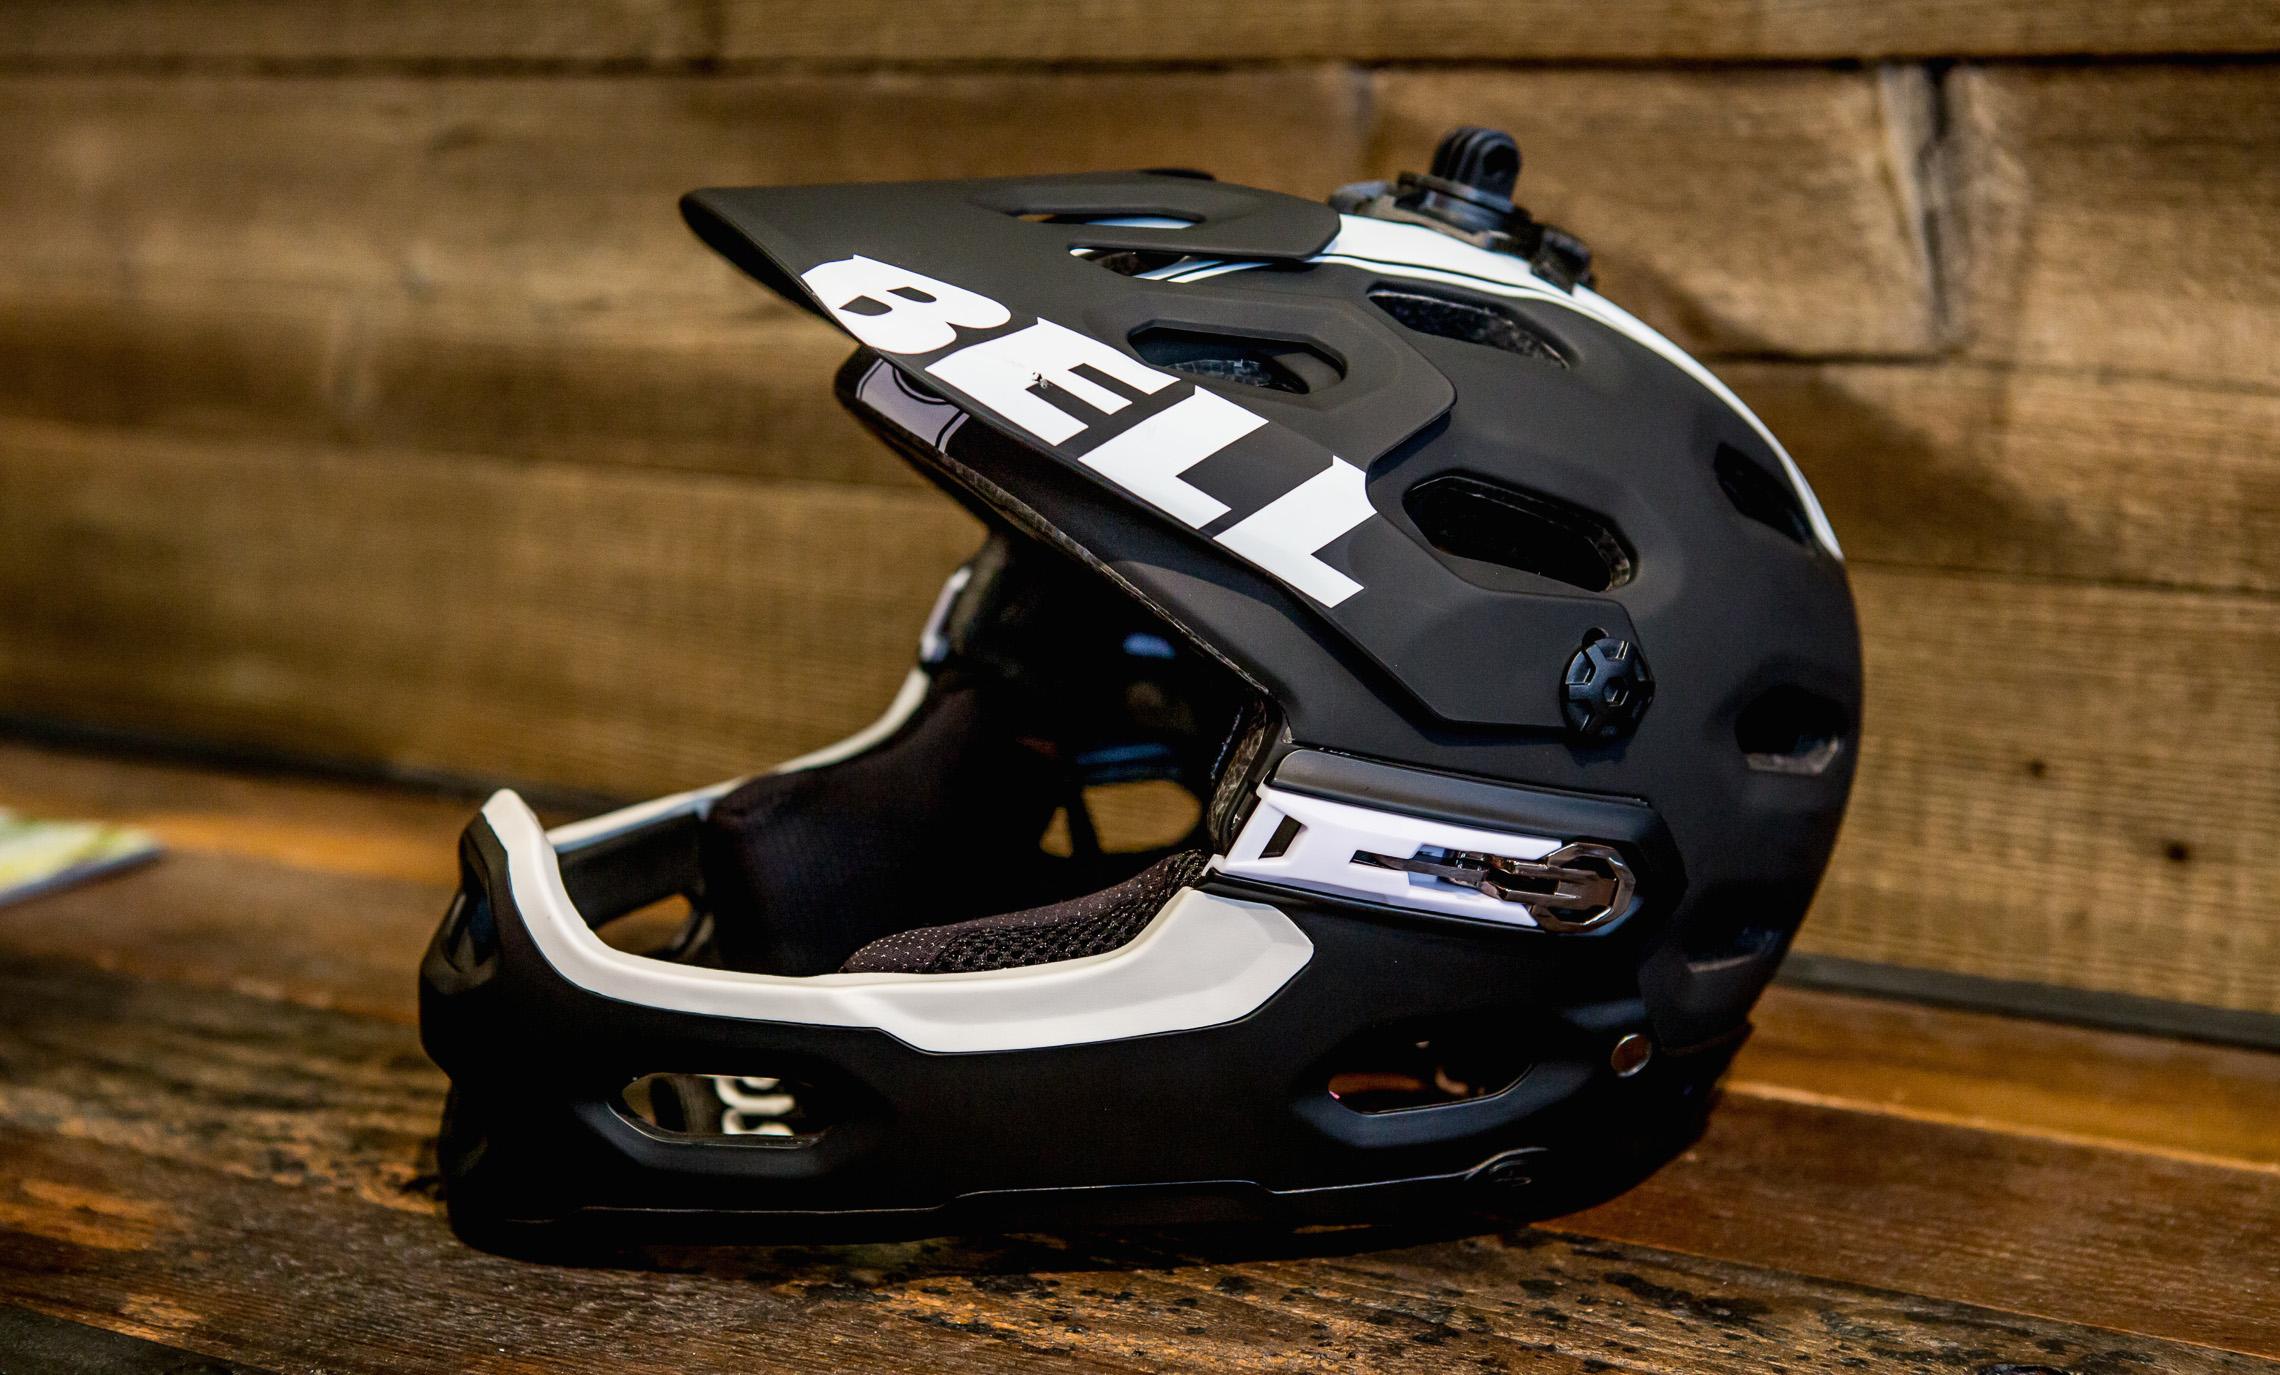 bell super 2r helm mit abnehmbarem kinnb gel und mips. Black Bedroom Furniture Sets. Home Design Ideas